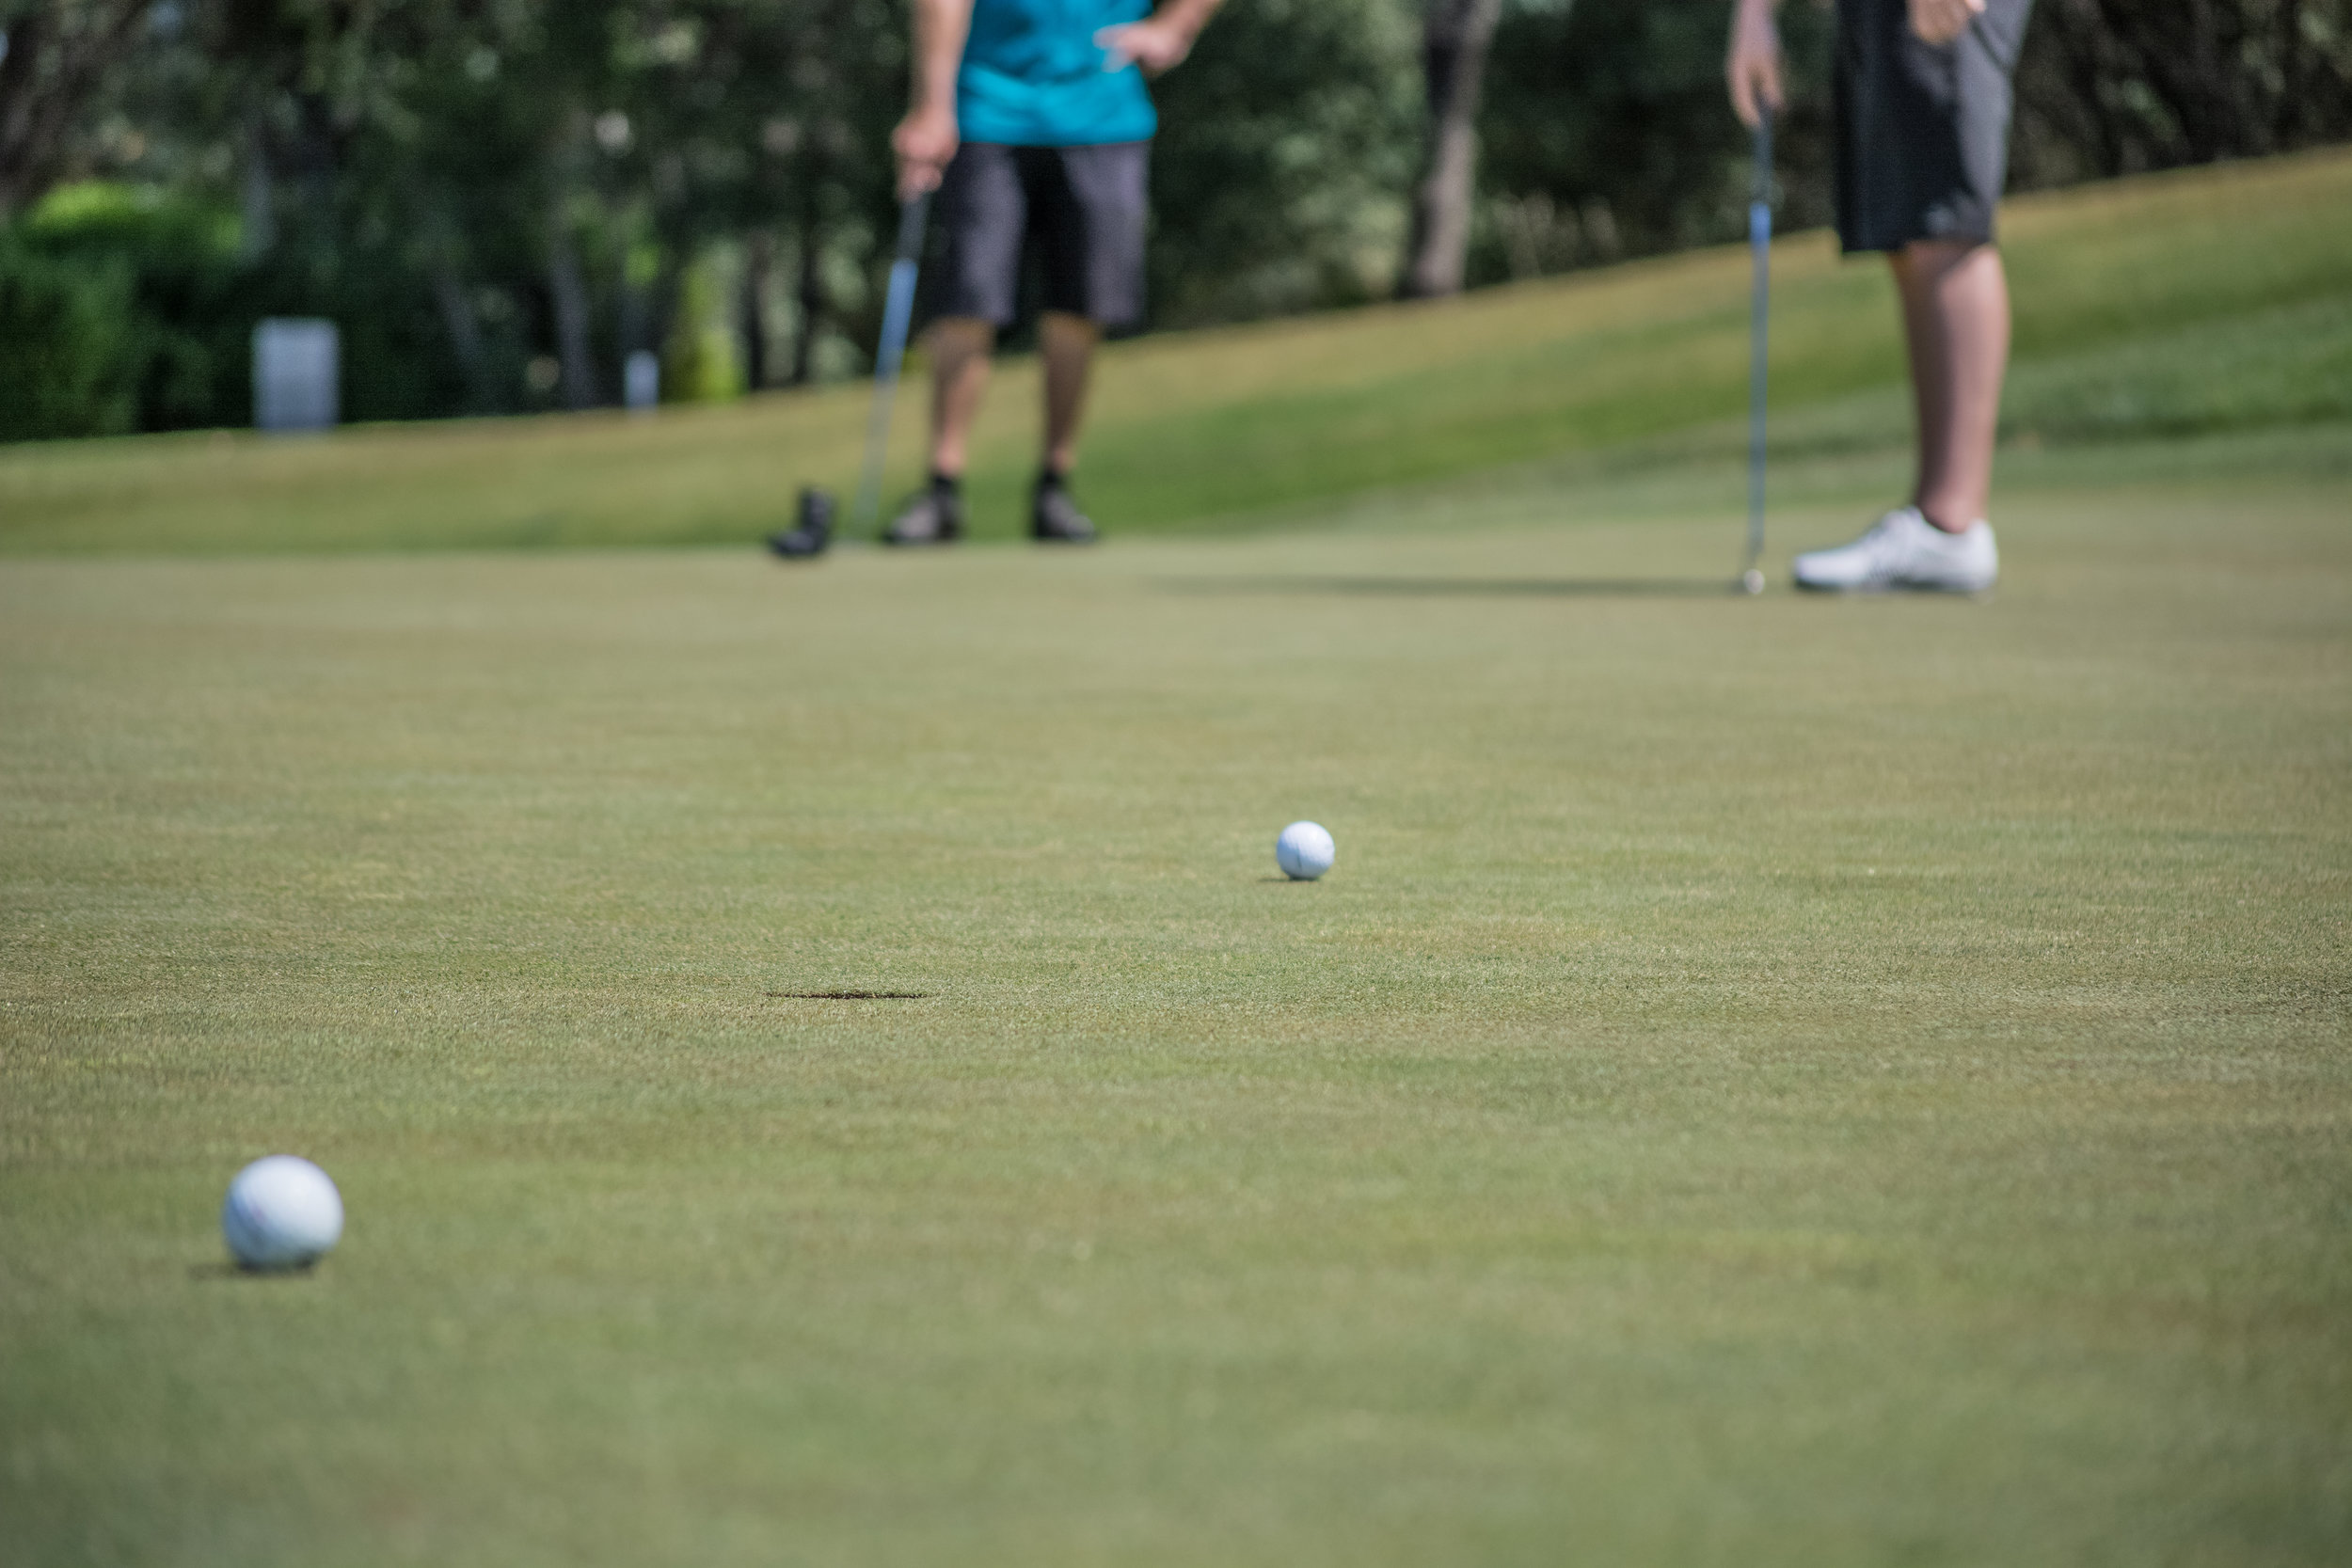 golfing-in-retirement